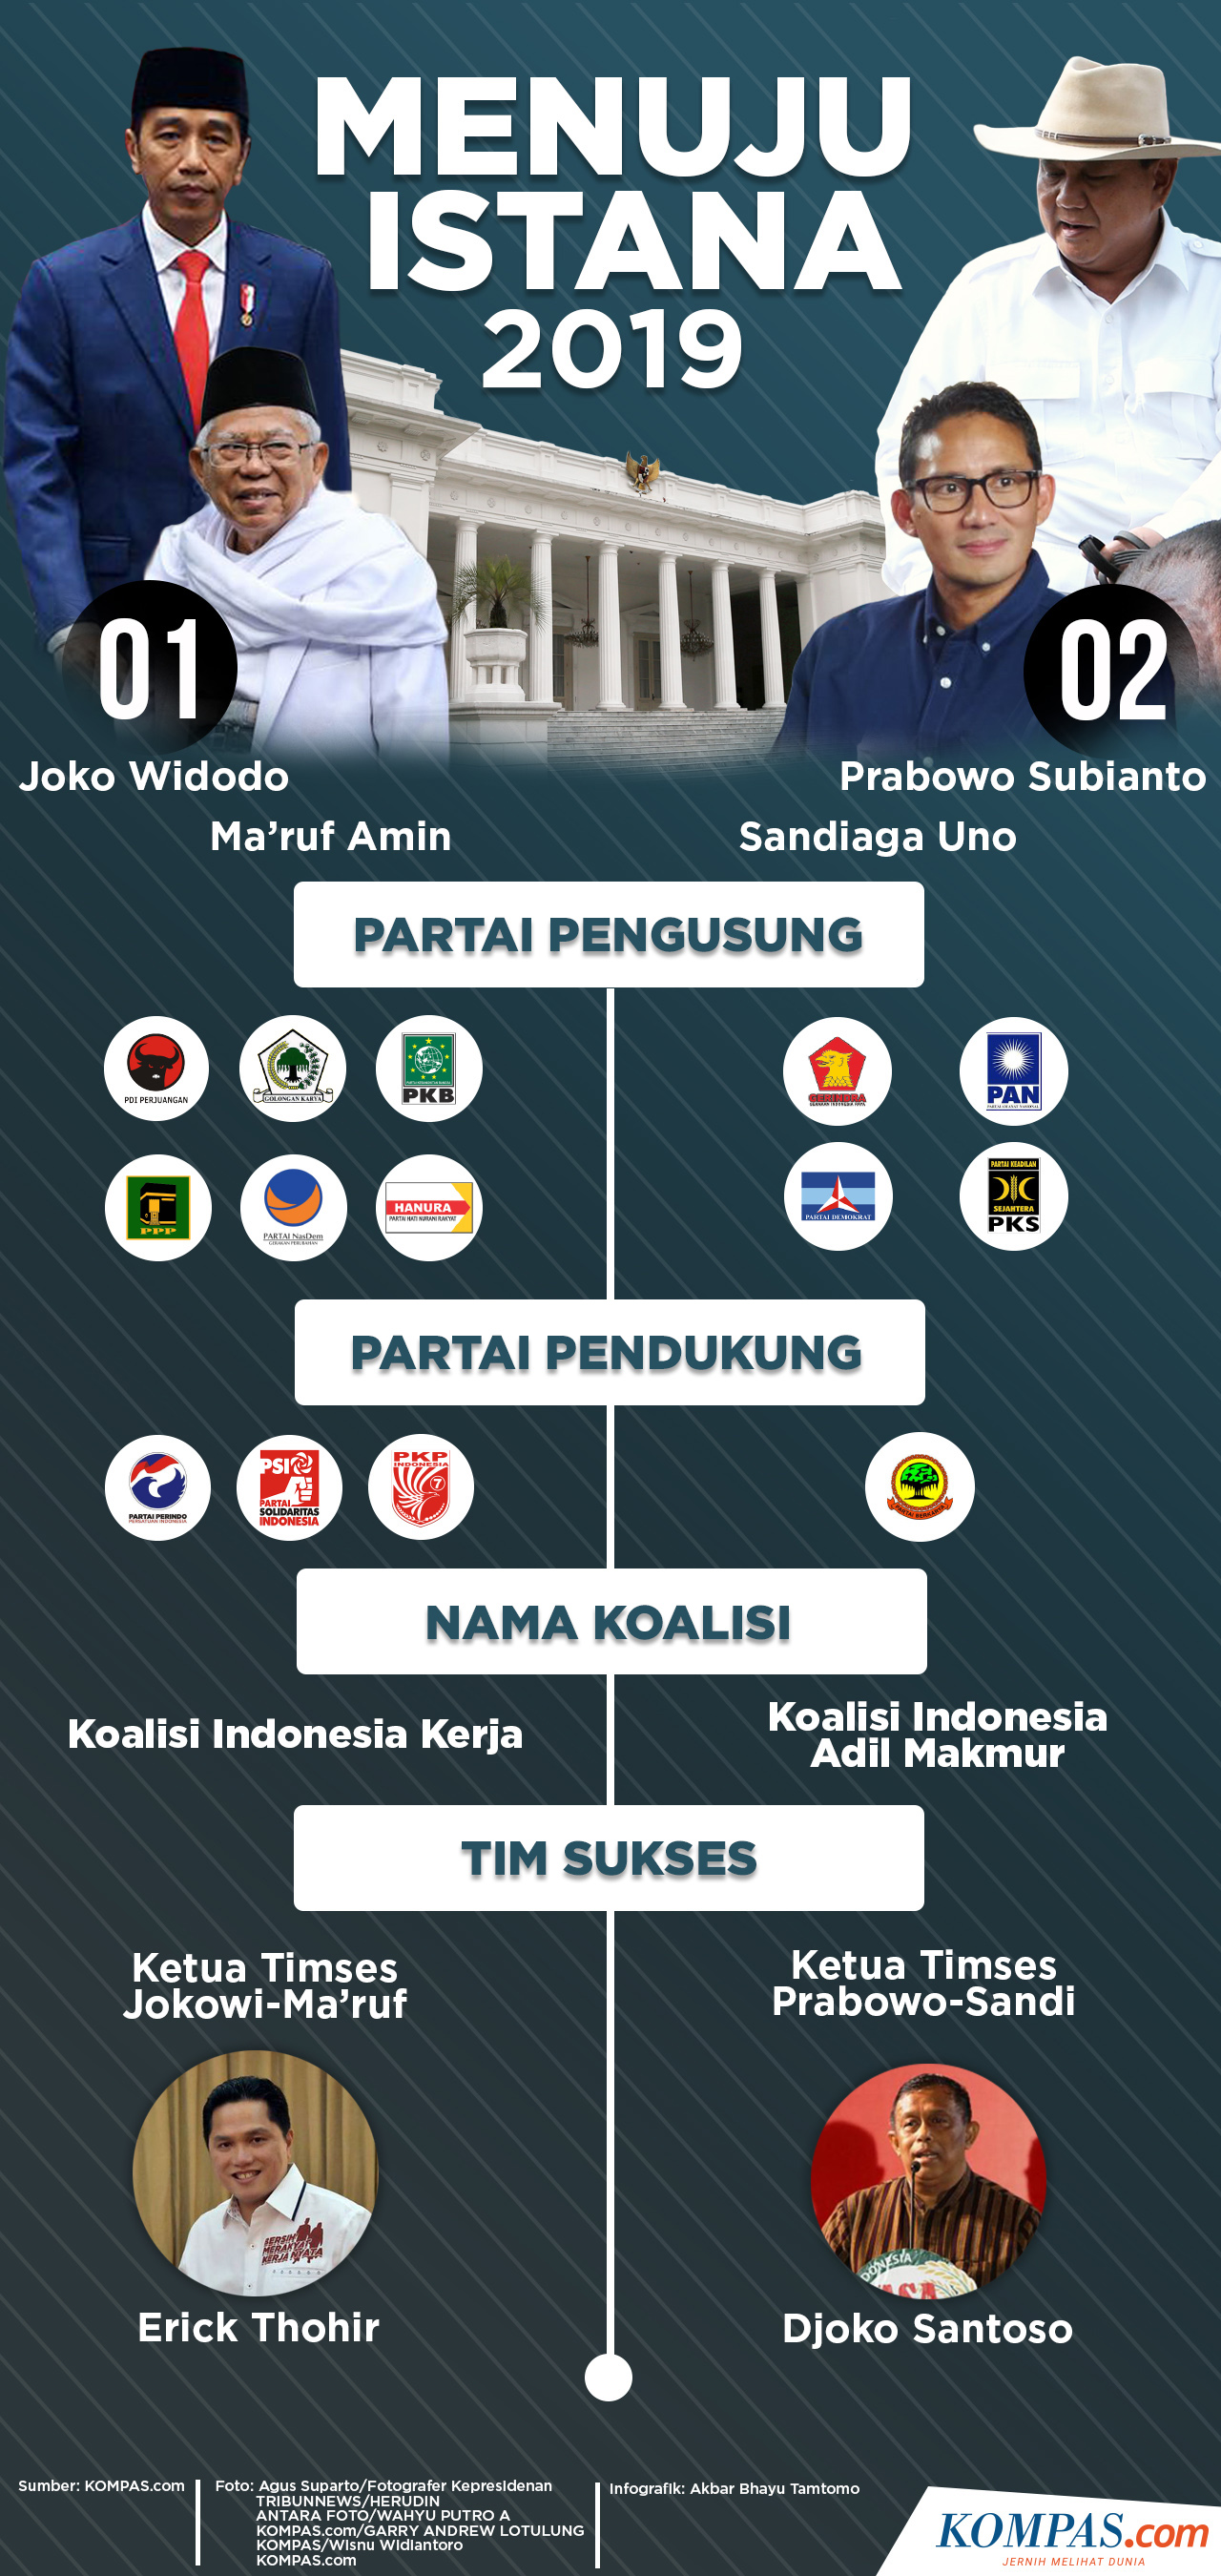 Infografik: Menuju Istana 2019